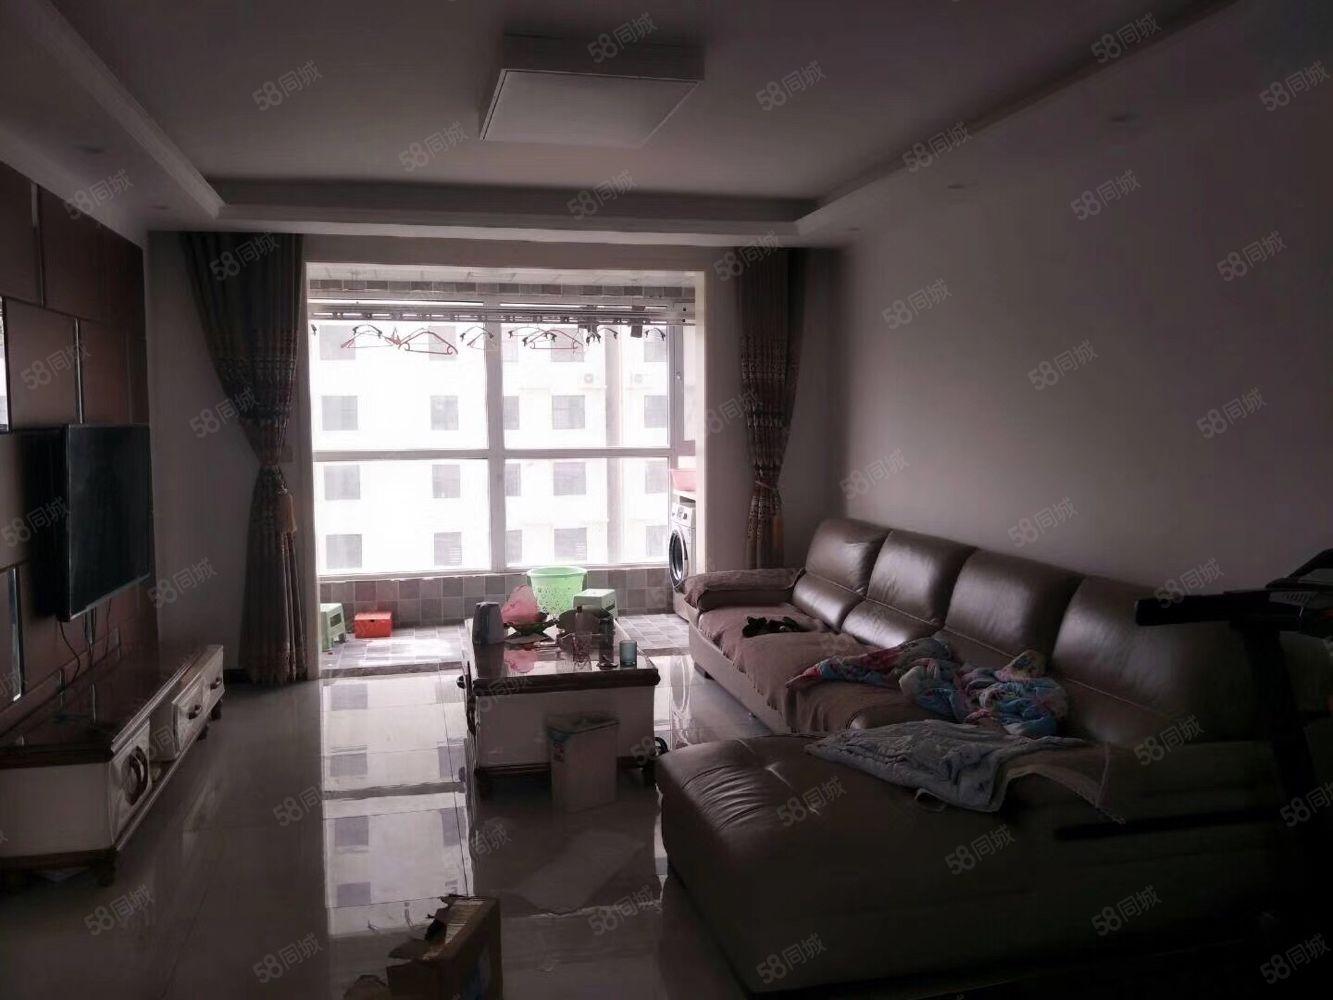 �W景�A庭三室��d�尚l南北通透118�f142平有房本配合�J款